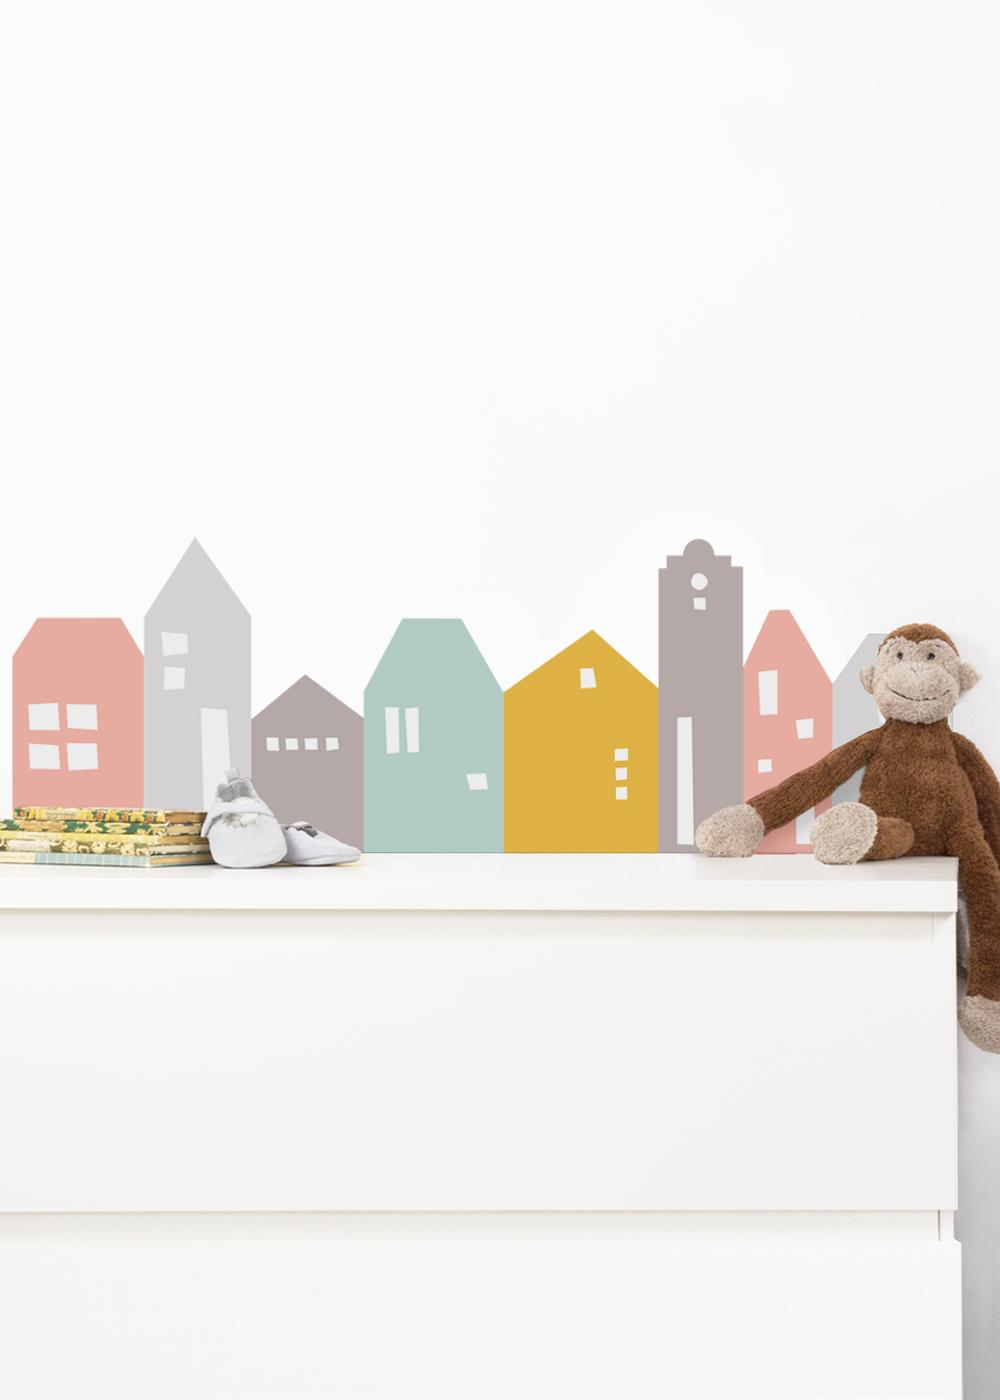 Ikea Mansarp Bilderleiste Lille Hus Rosa hellgrau Gesamtansicht